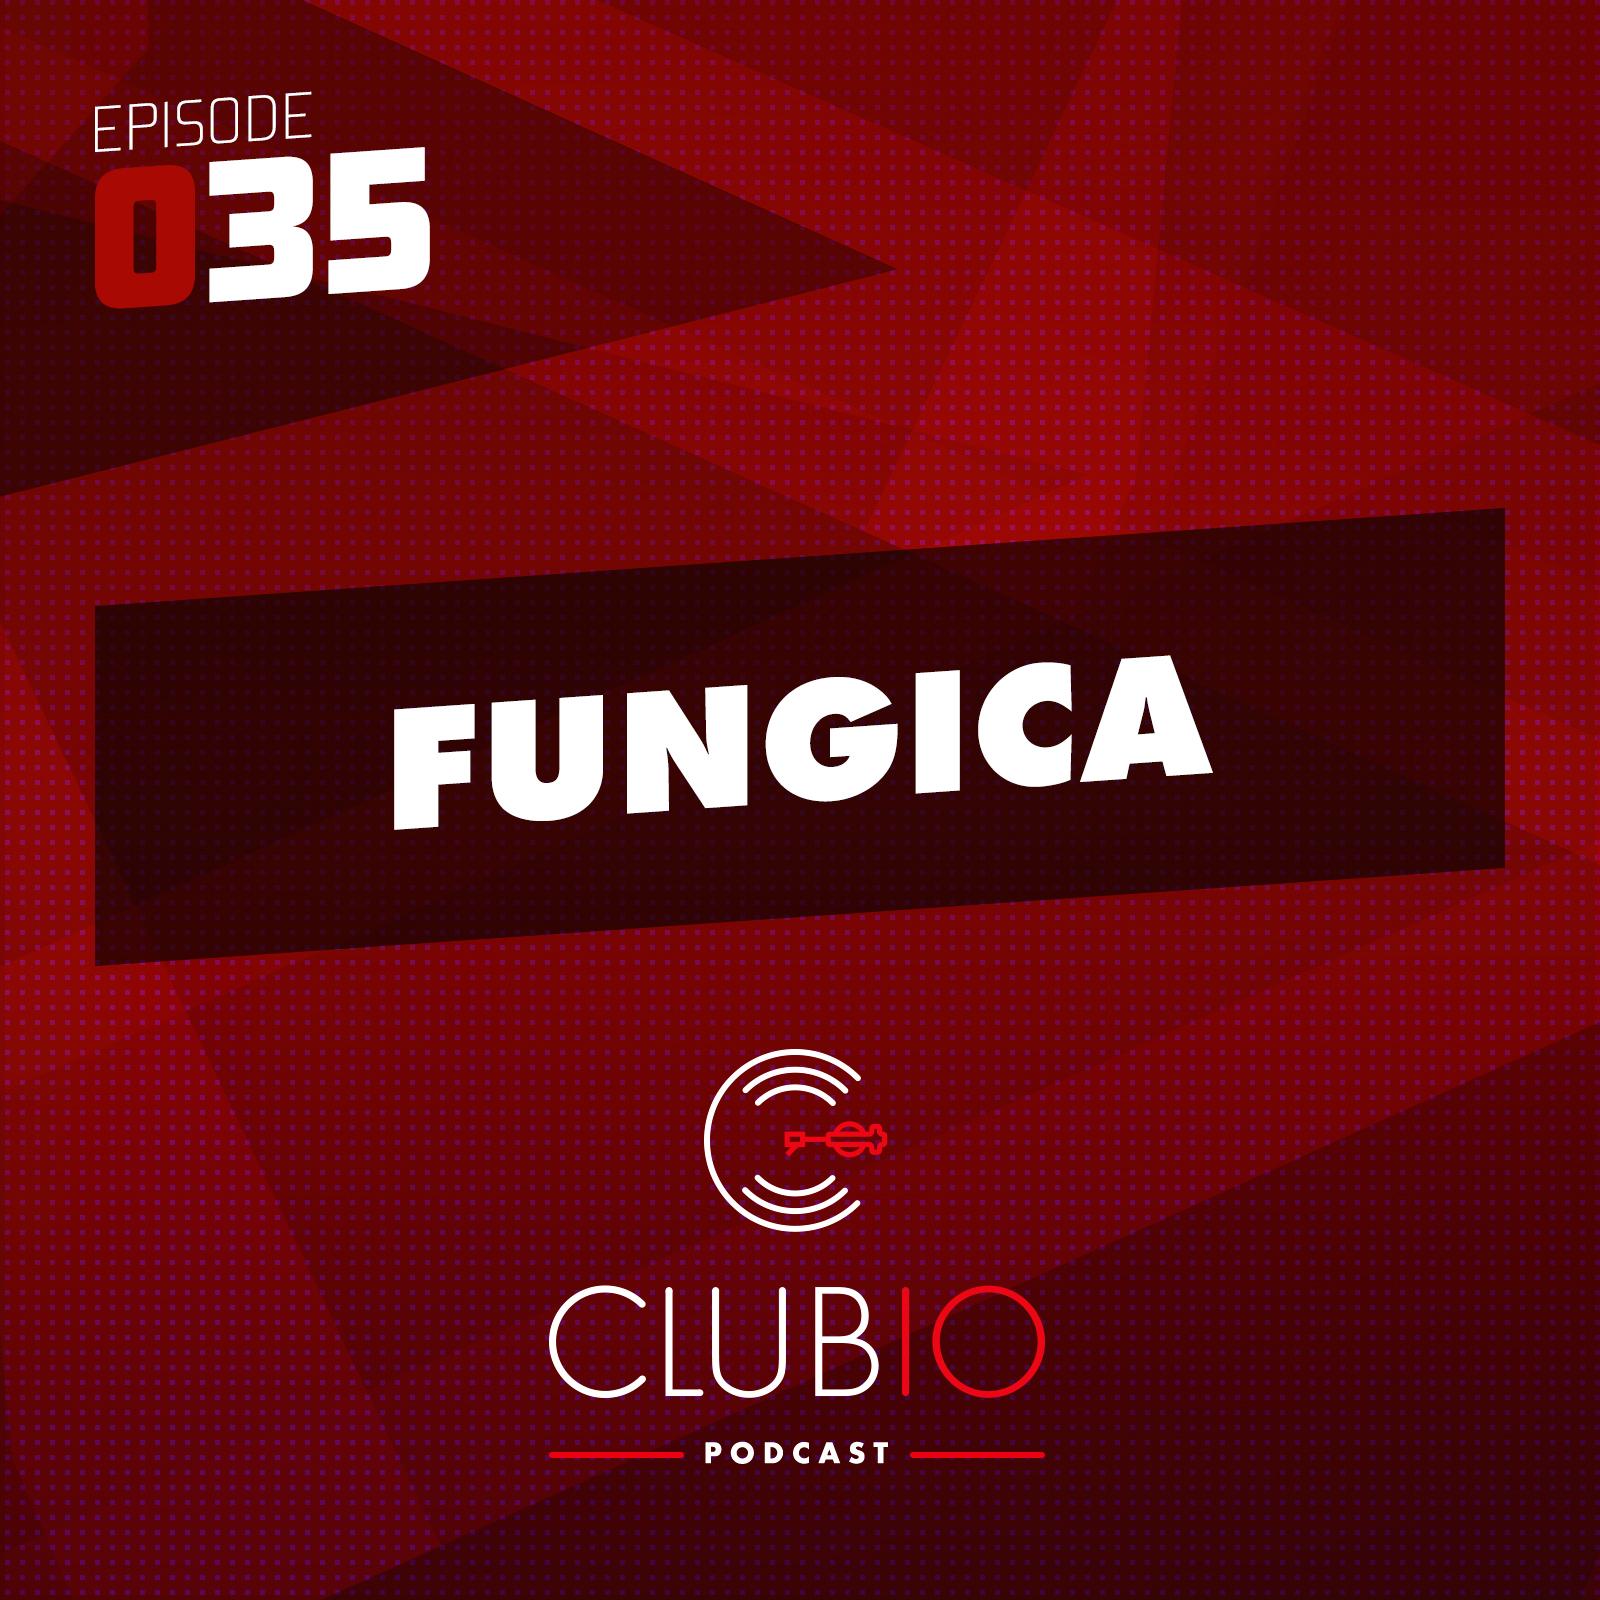 Clubio Podcast 035 - Fungica